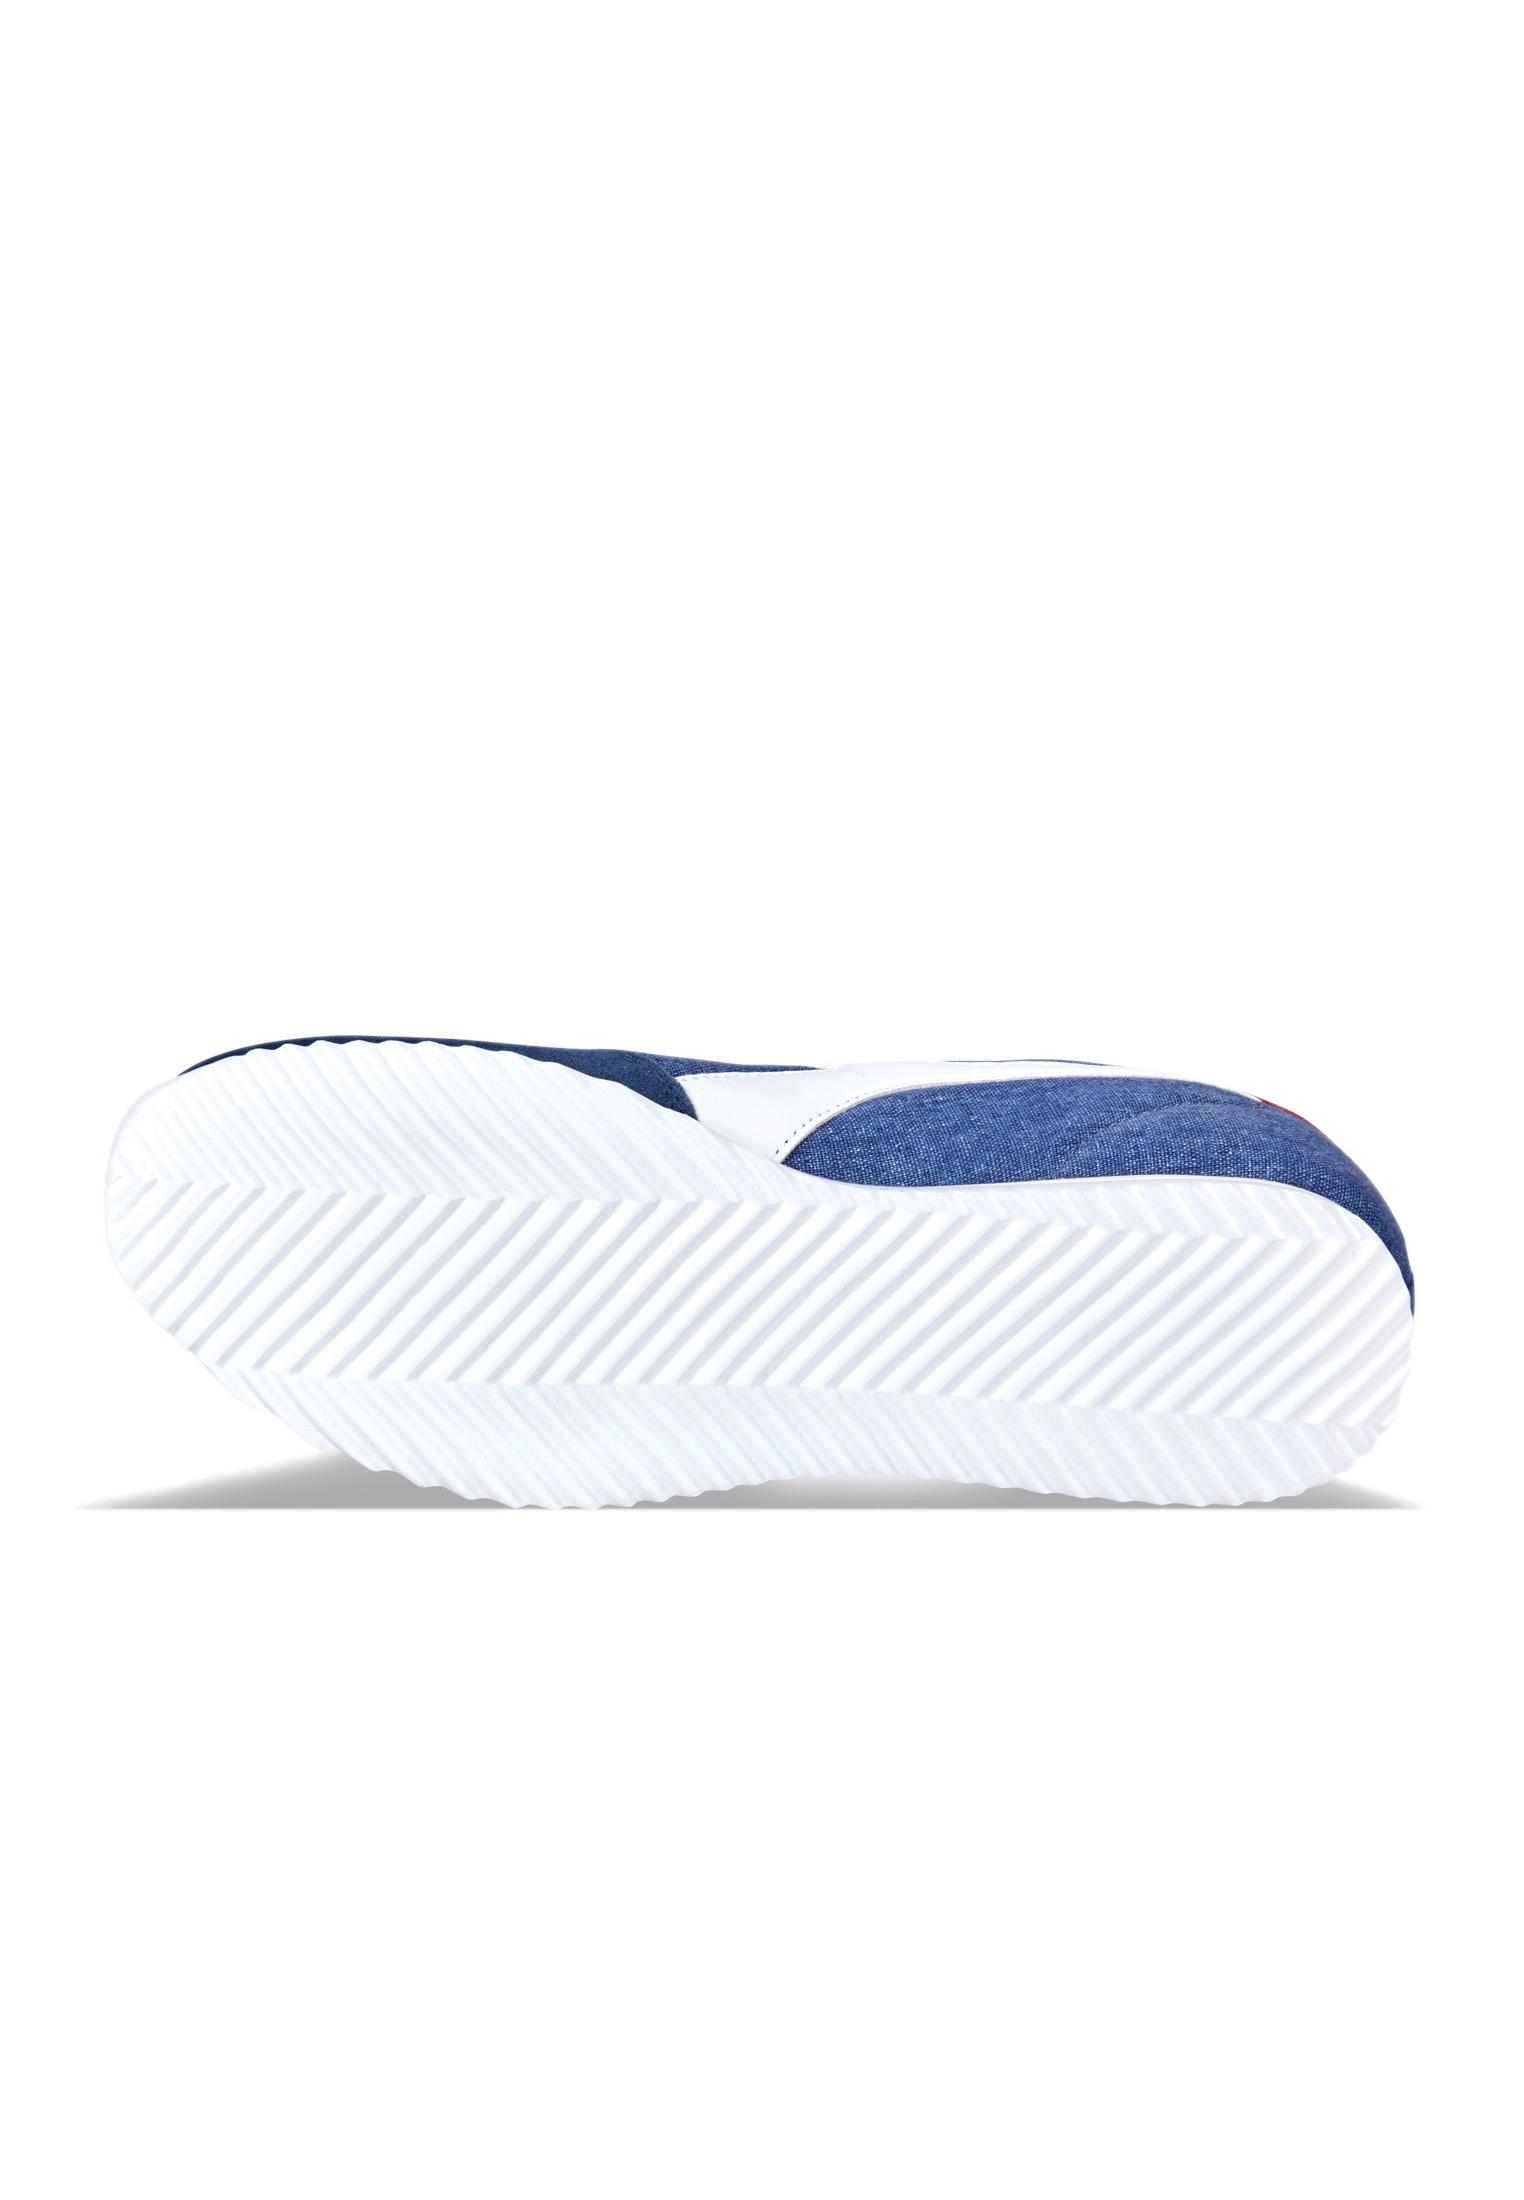 Scarpe-Diadora-Jog-Light-C-Sneakers-sportive-uomo-donna-vari-colori-e-taglie miniatura 33